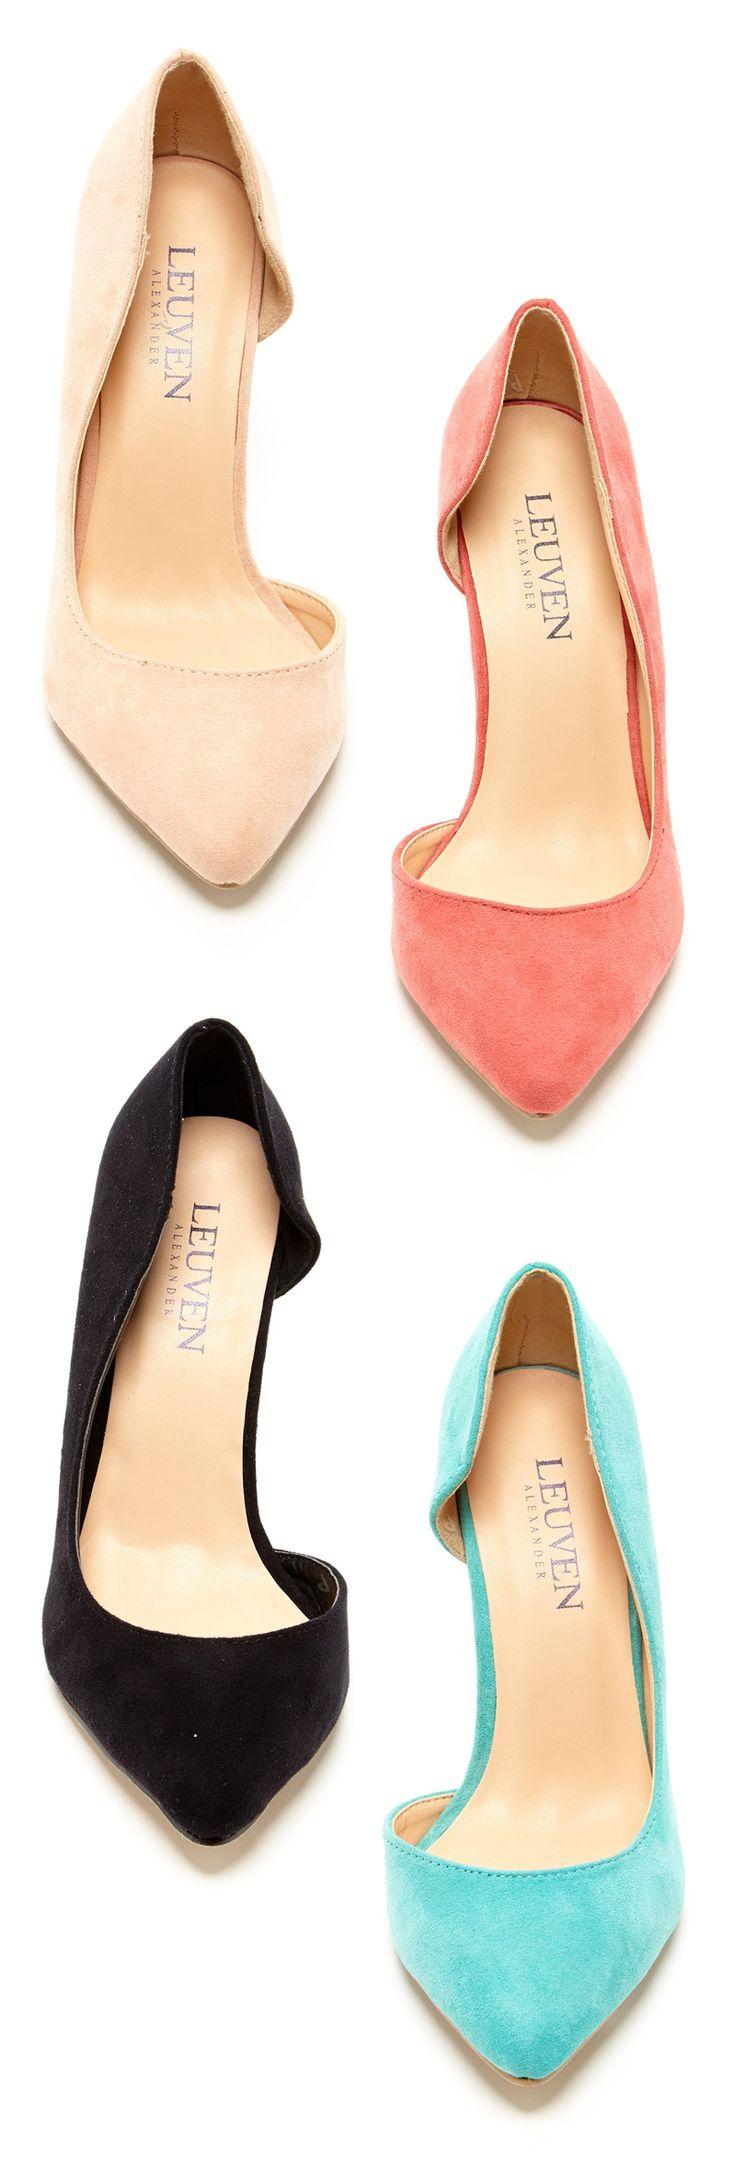 Half d'Orsay heels // honestly, I want them all...